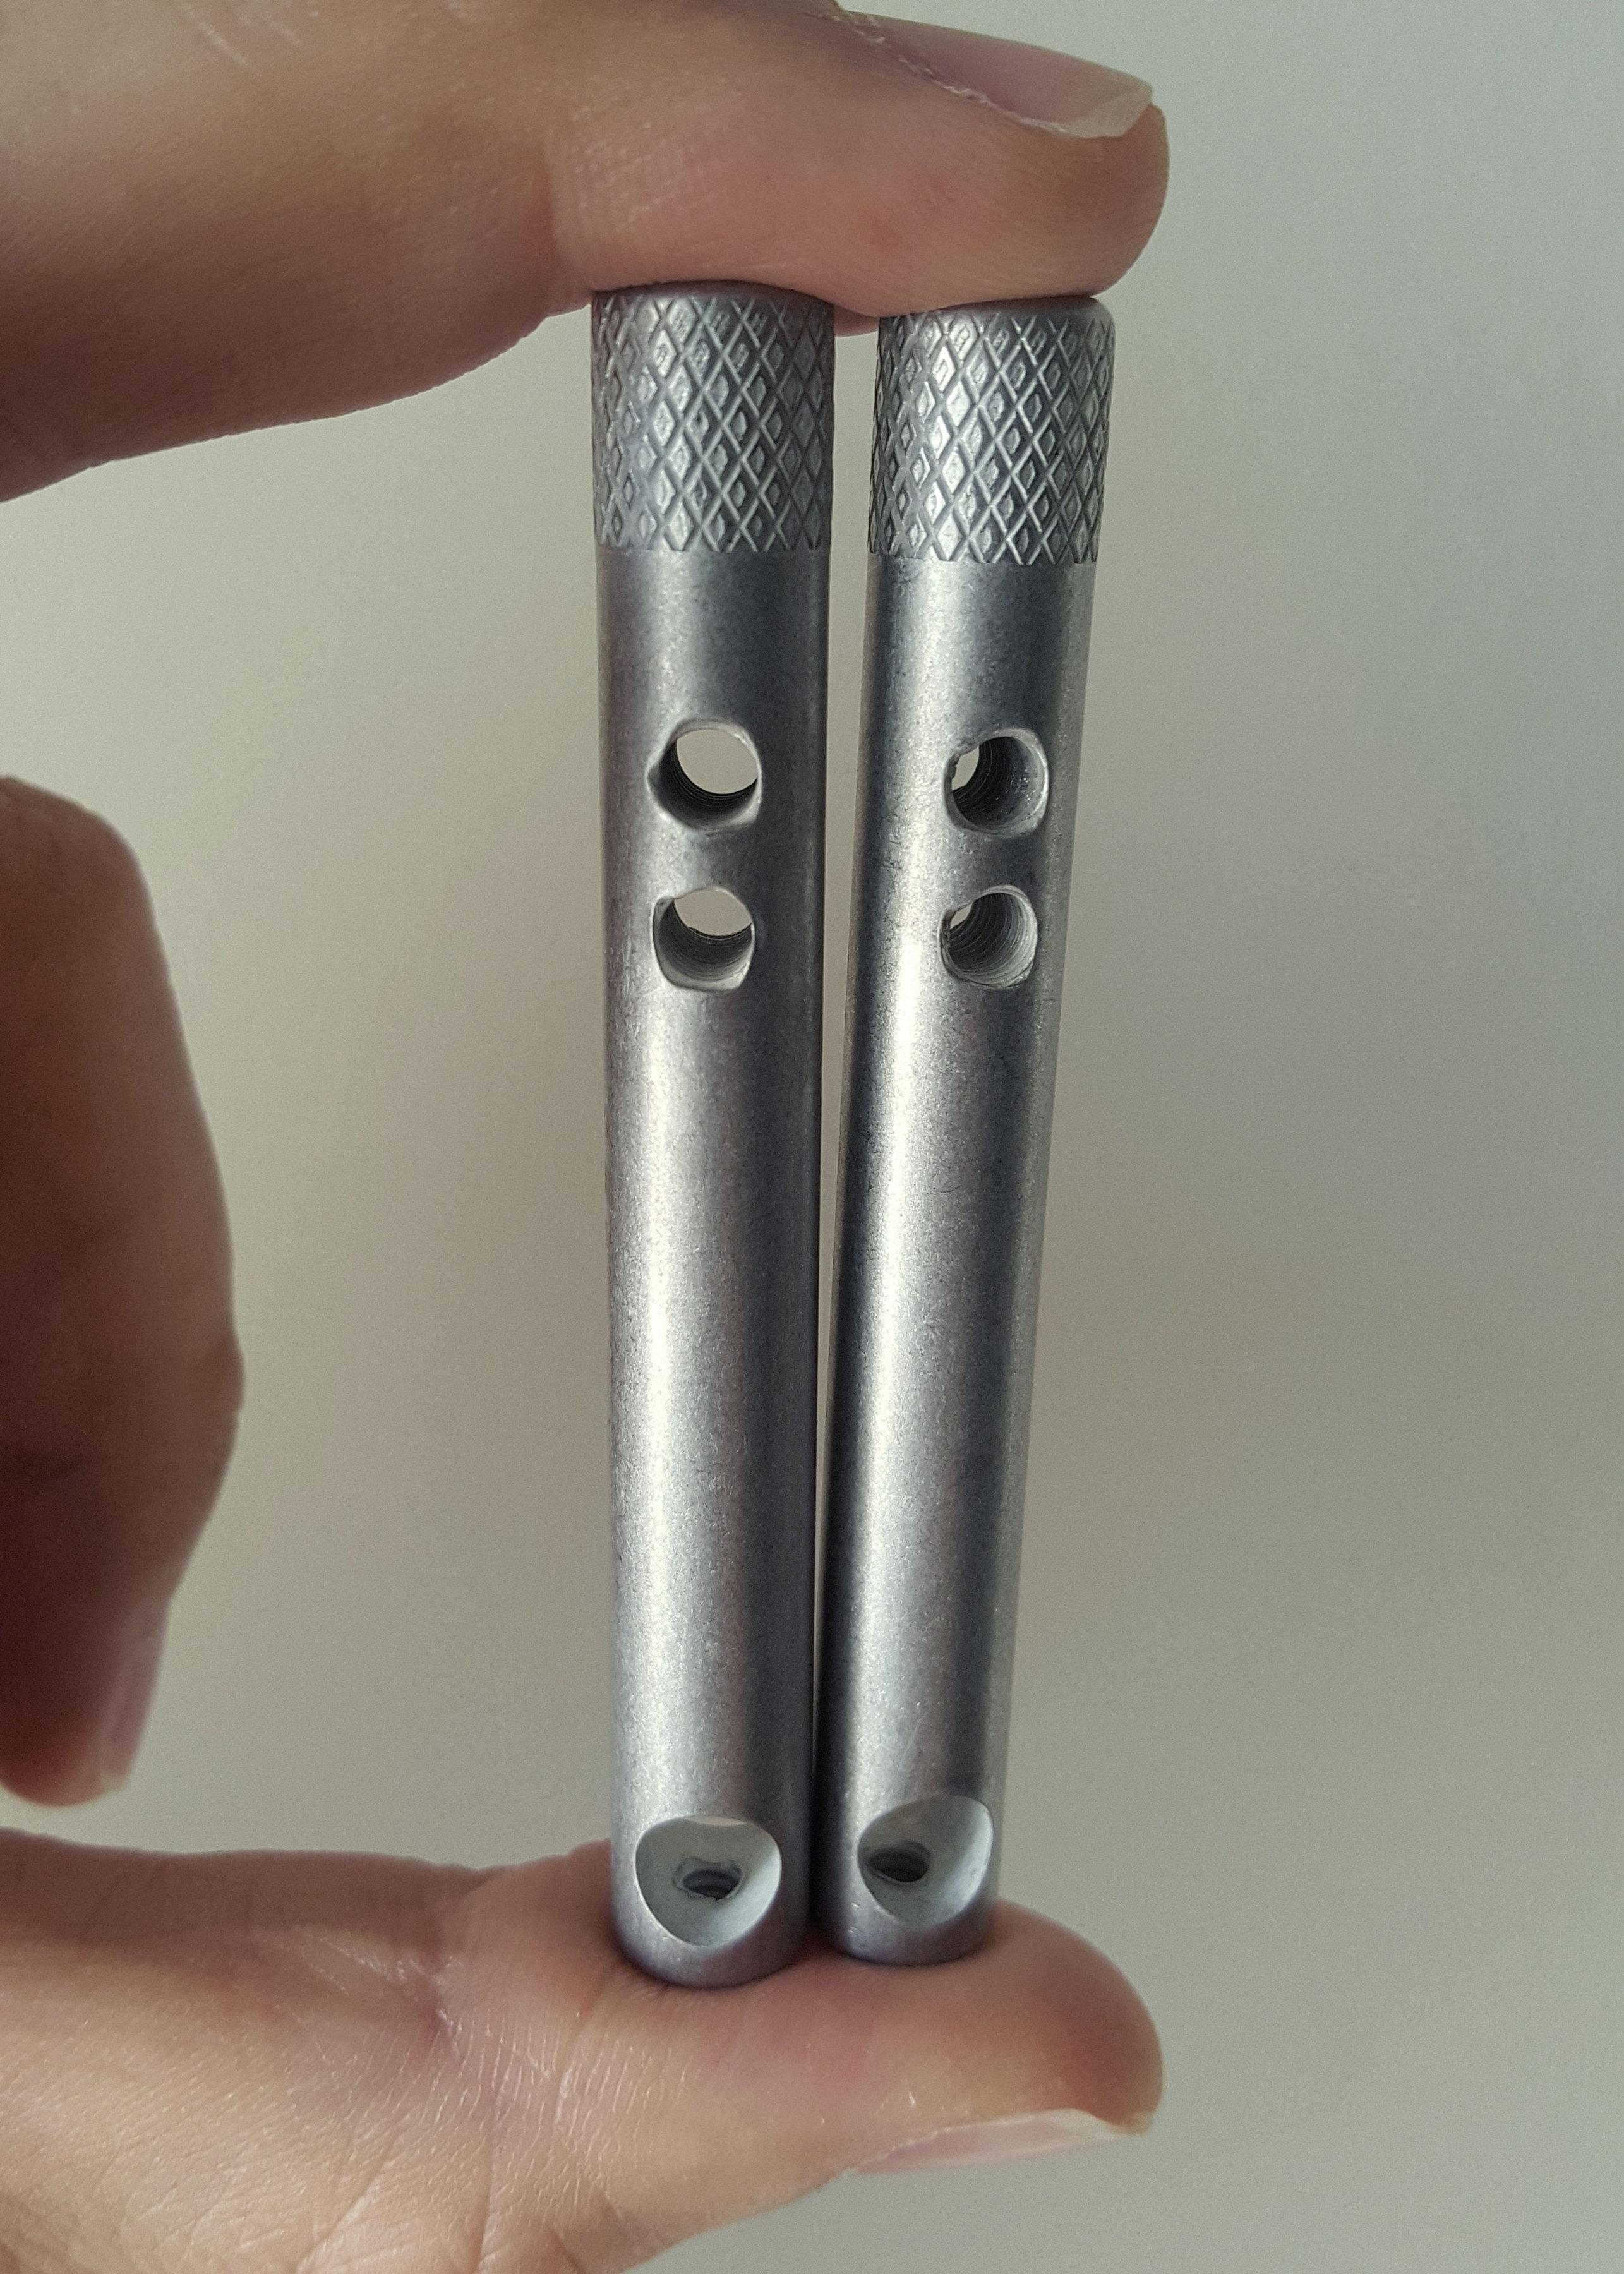 Mitchell-stylus-brush-1.jpg